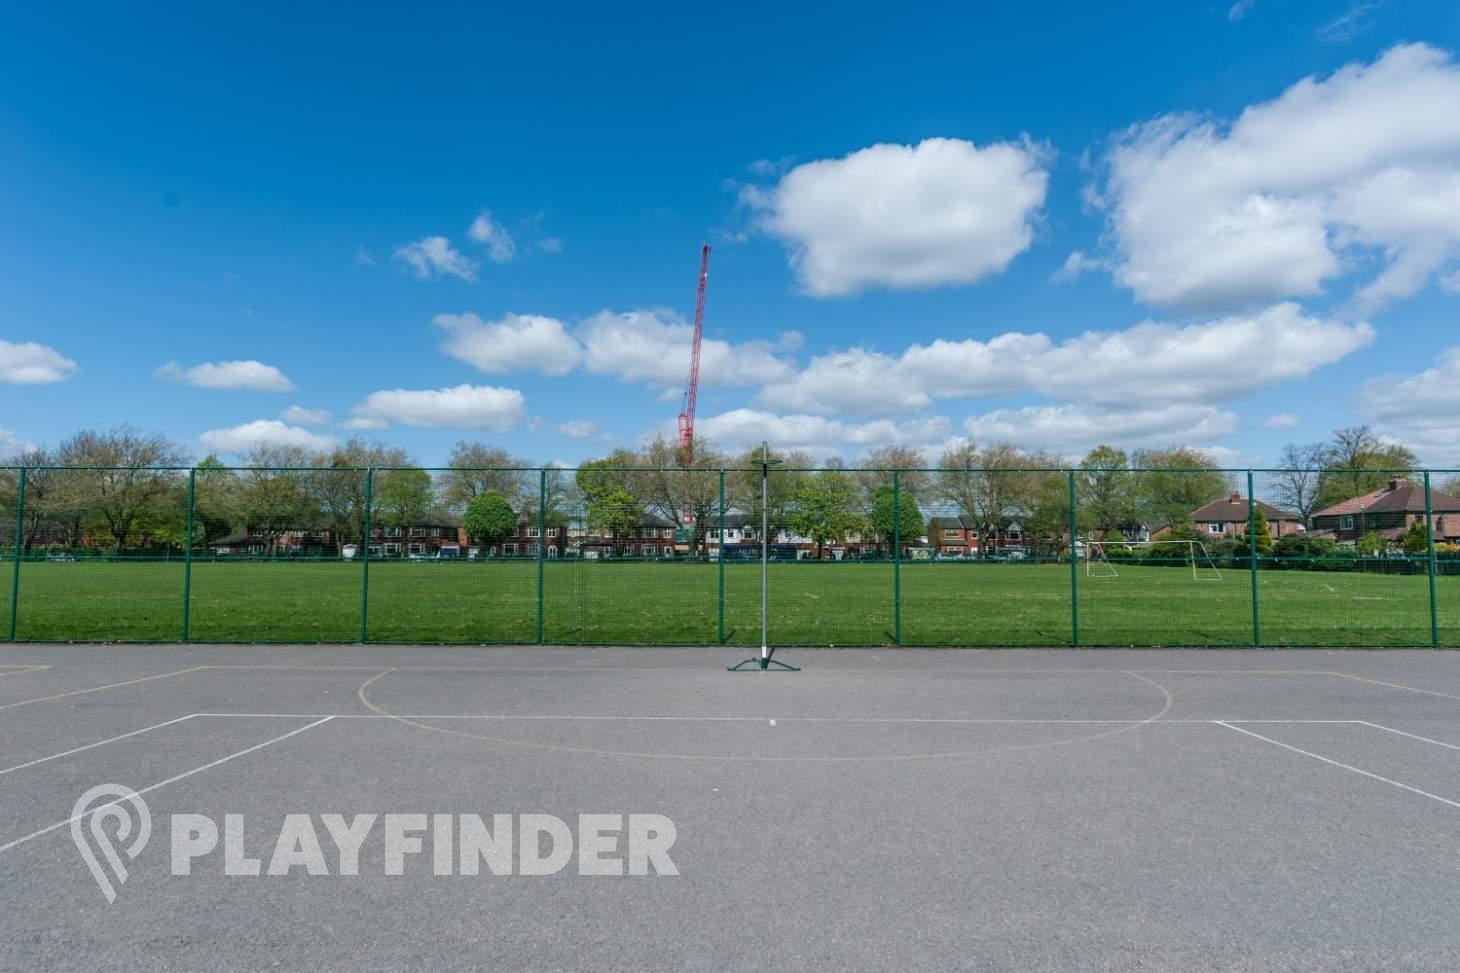 Flixton Girls School Outdoor | Concrete netball court